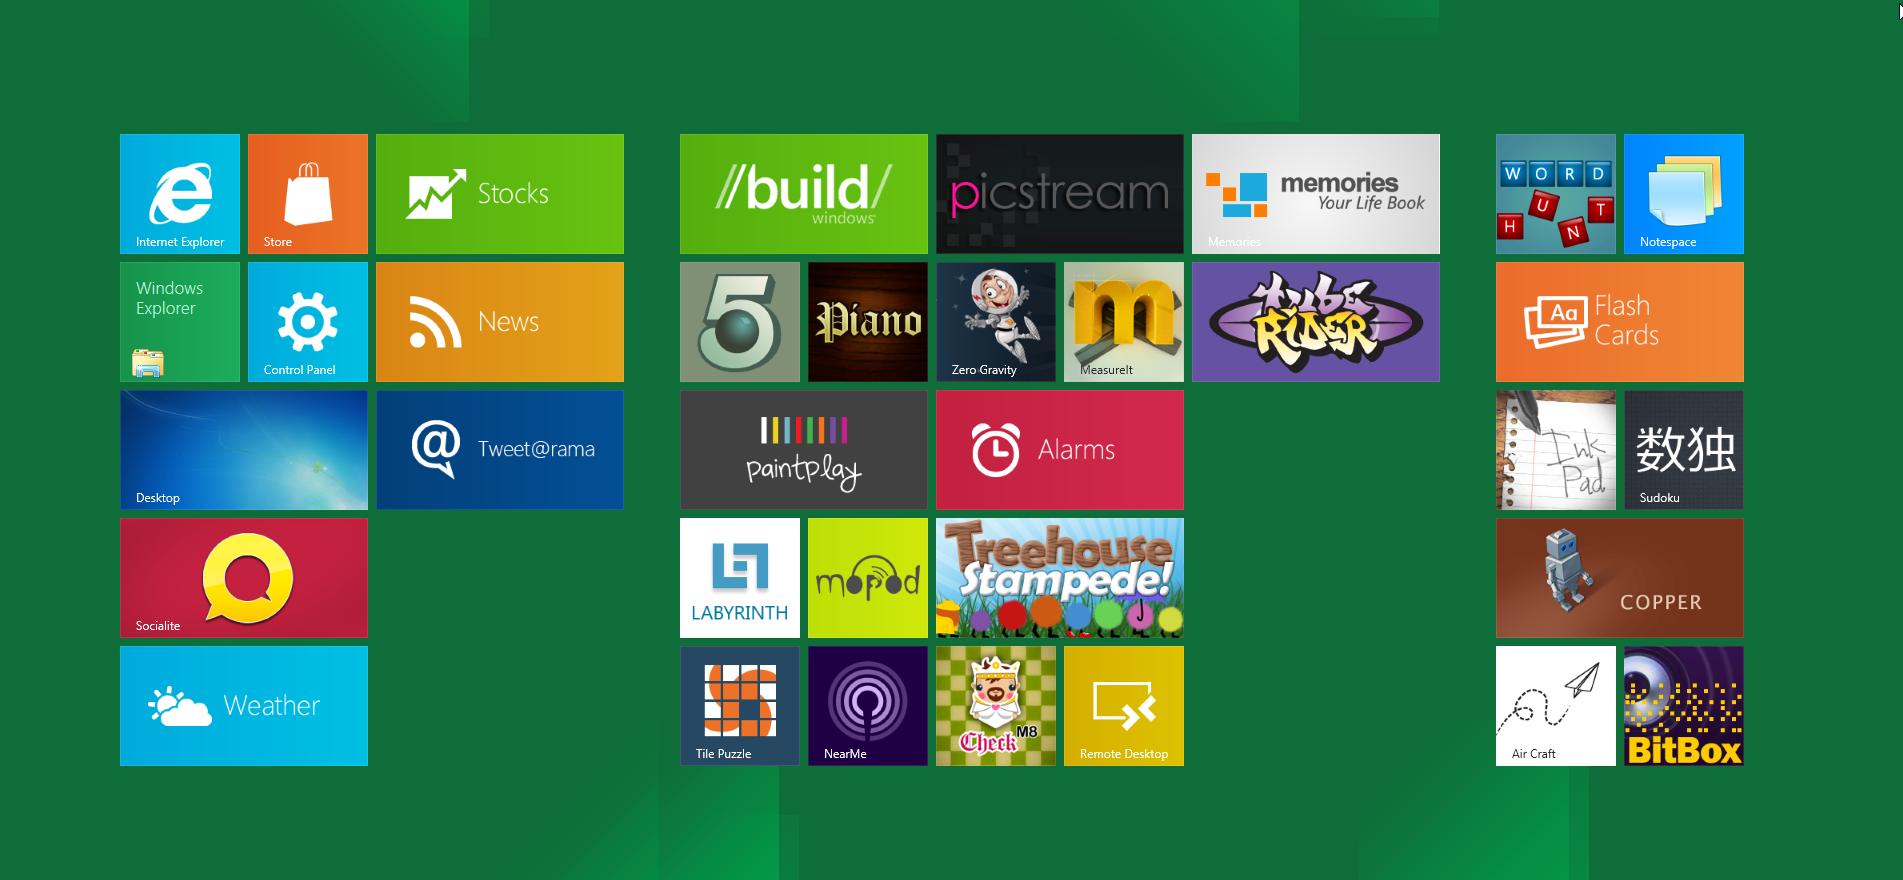 Windows8-MetroUI-EdgeUI-200.png?nocache=1316167074874